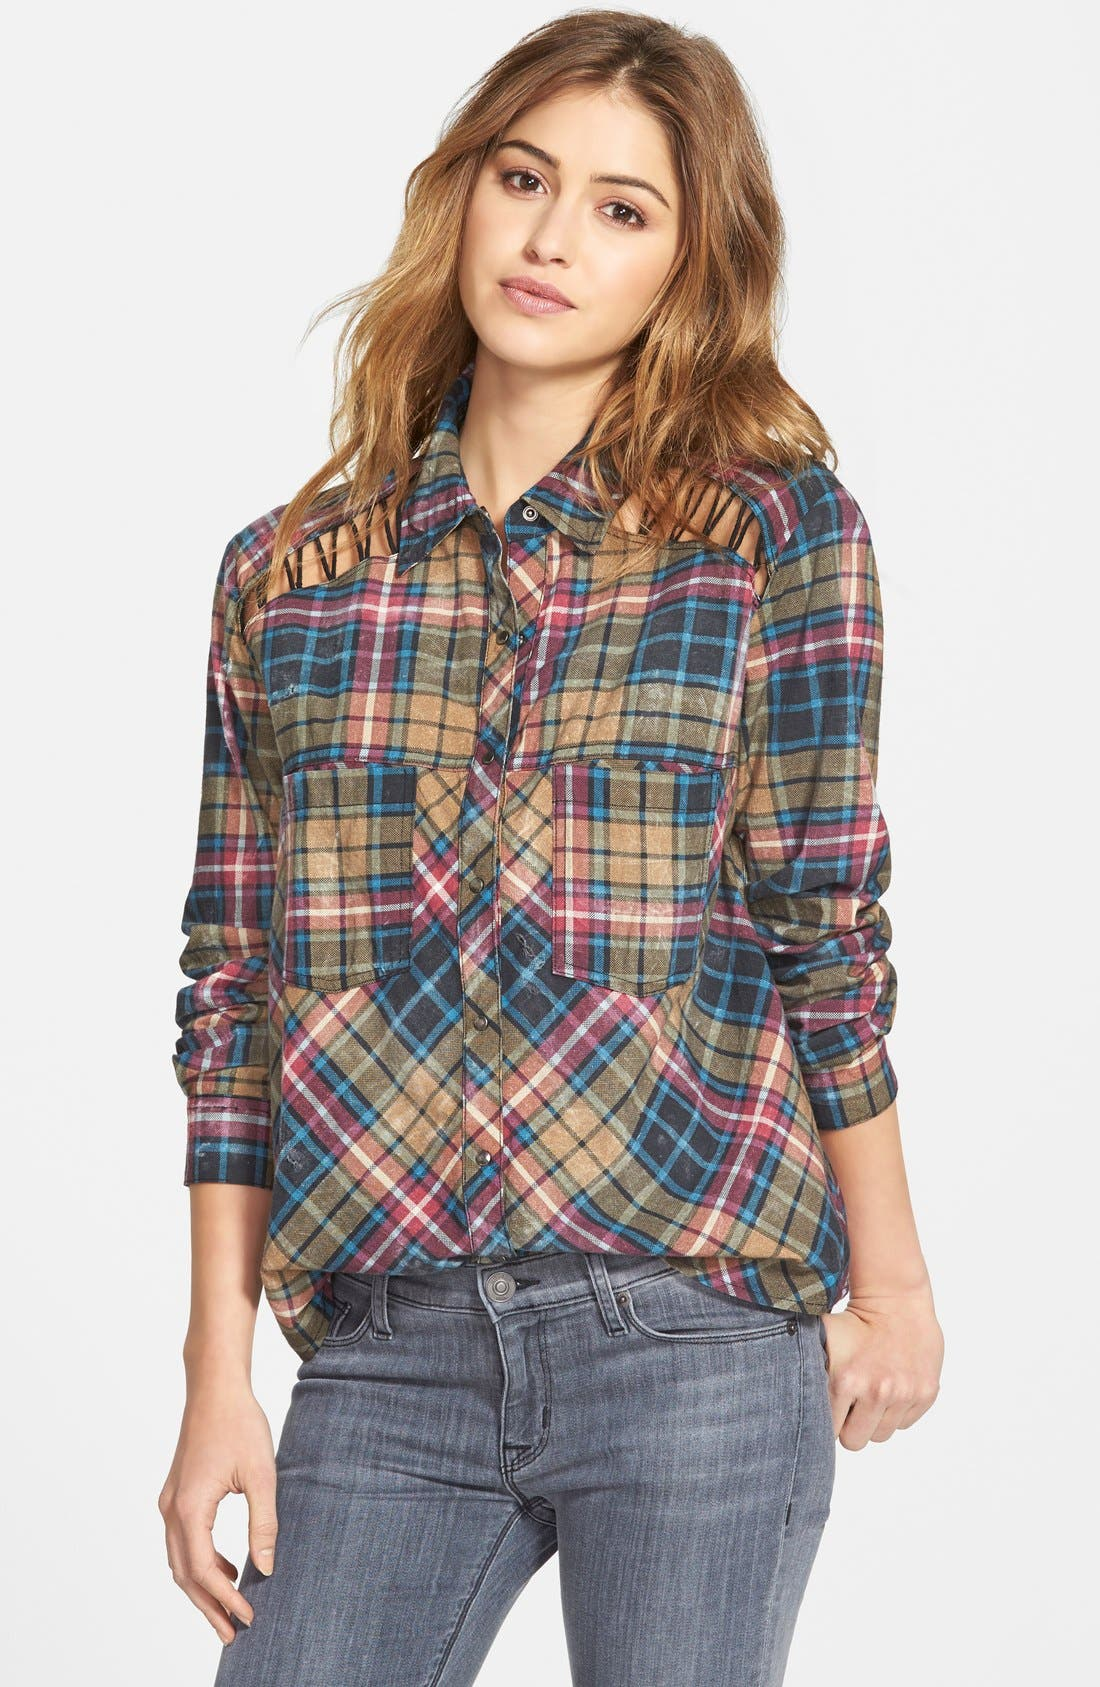 FREE PEOPLE Stitch Detail Plaid Shirt, Main, color, 300